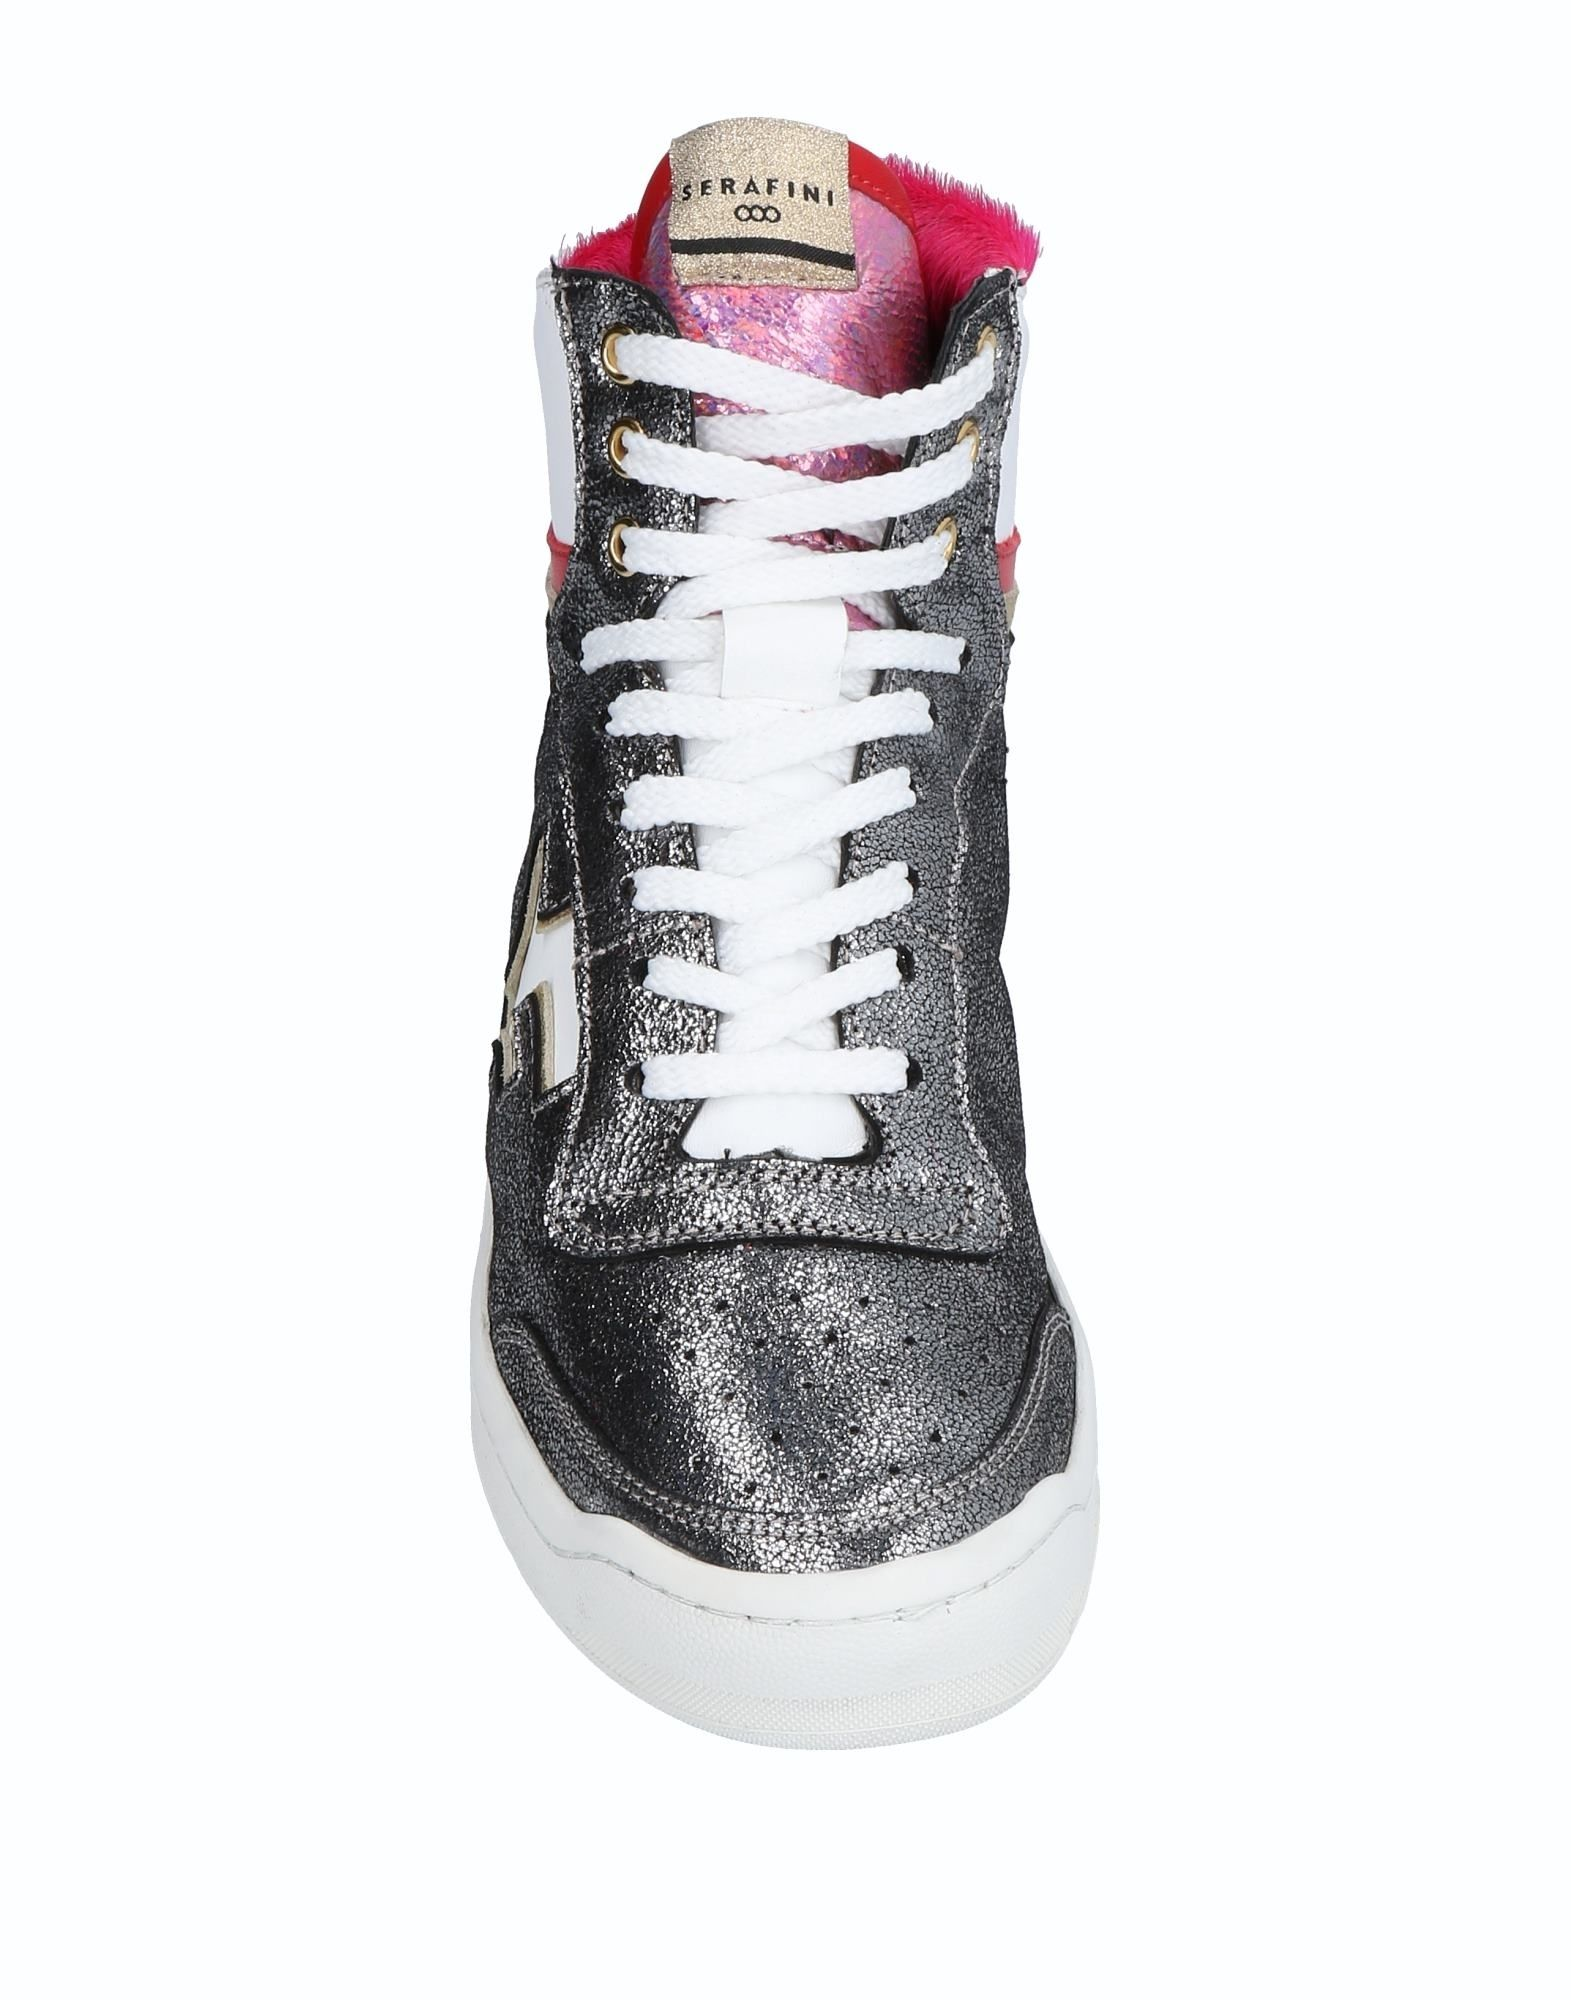 Serafini 11512121HBGut Luxury Sneakers Damen  11512121HBGut Serafini aussehende strapazierfähige Schuhe 085b10